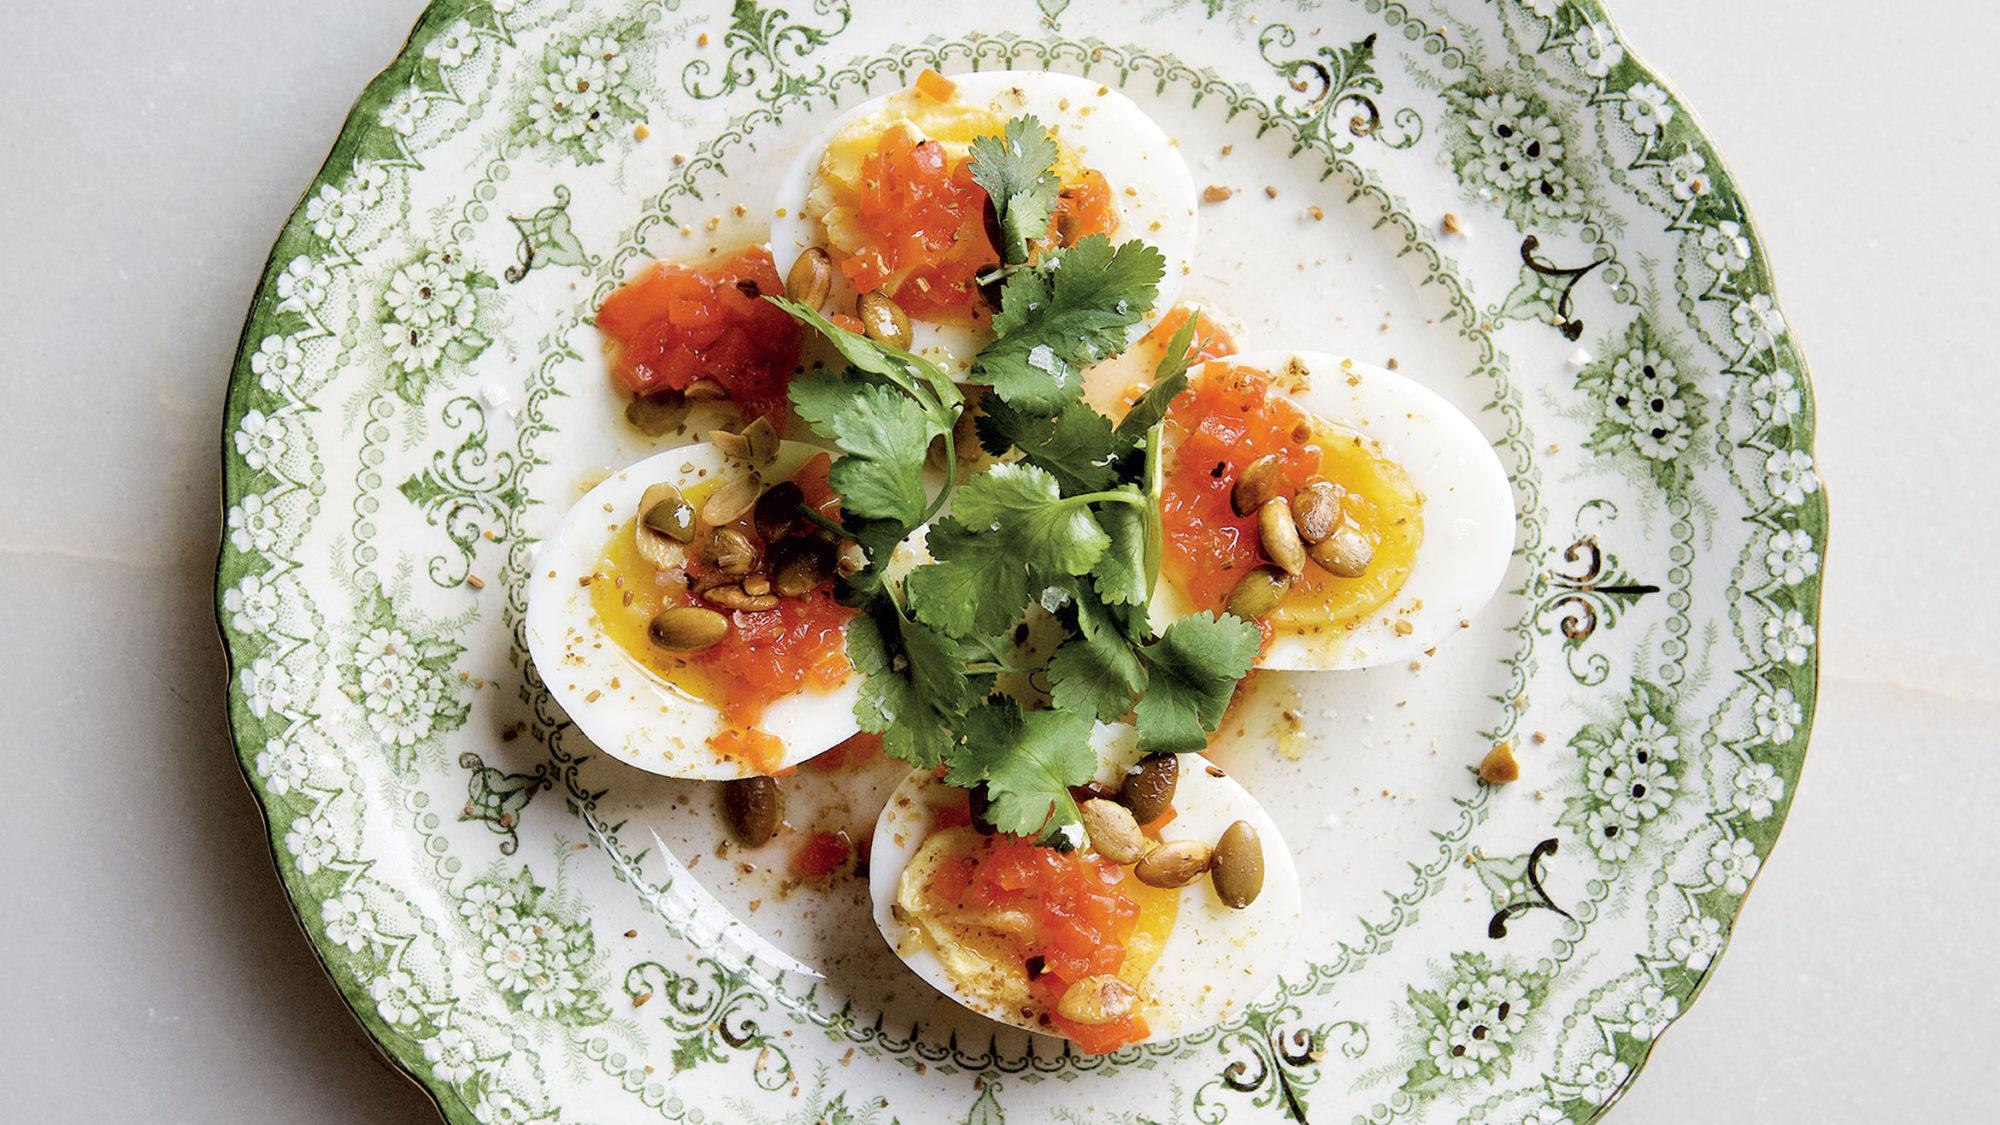 Article-How-to-Dress-an-Egg-Cookbook-Ned-Baldwin-Peter-Kaminsky